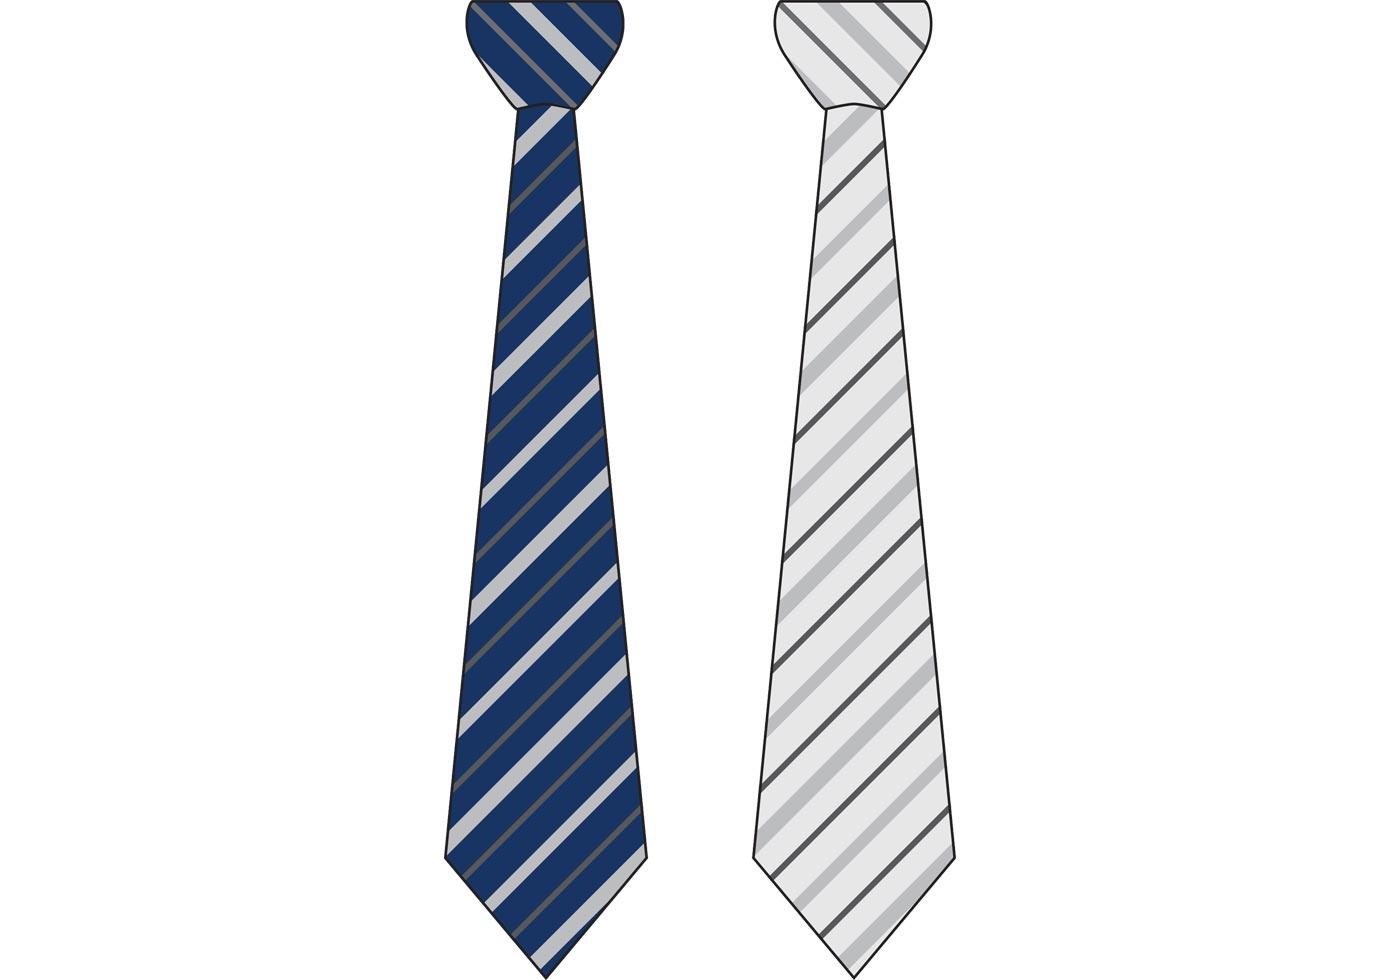 Fashion Bow Tie